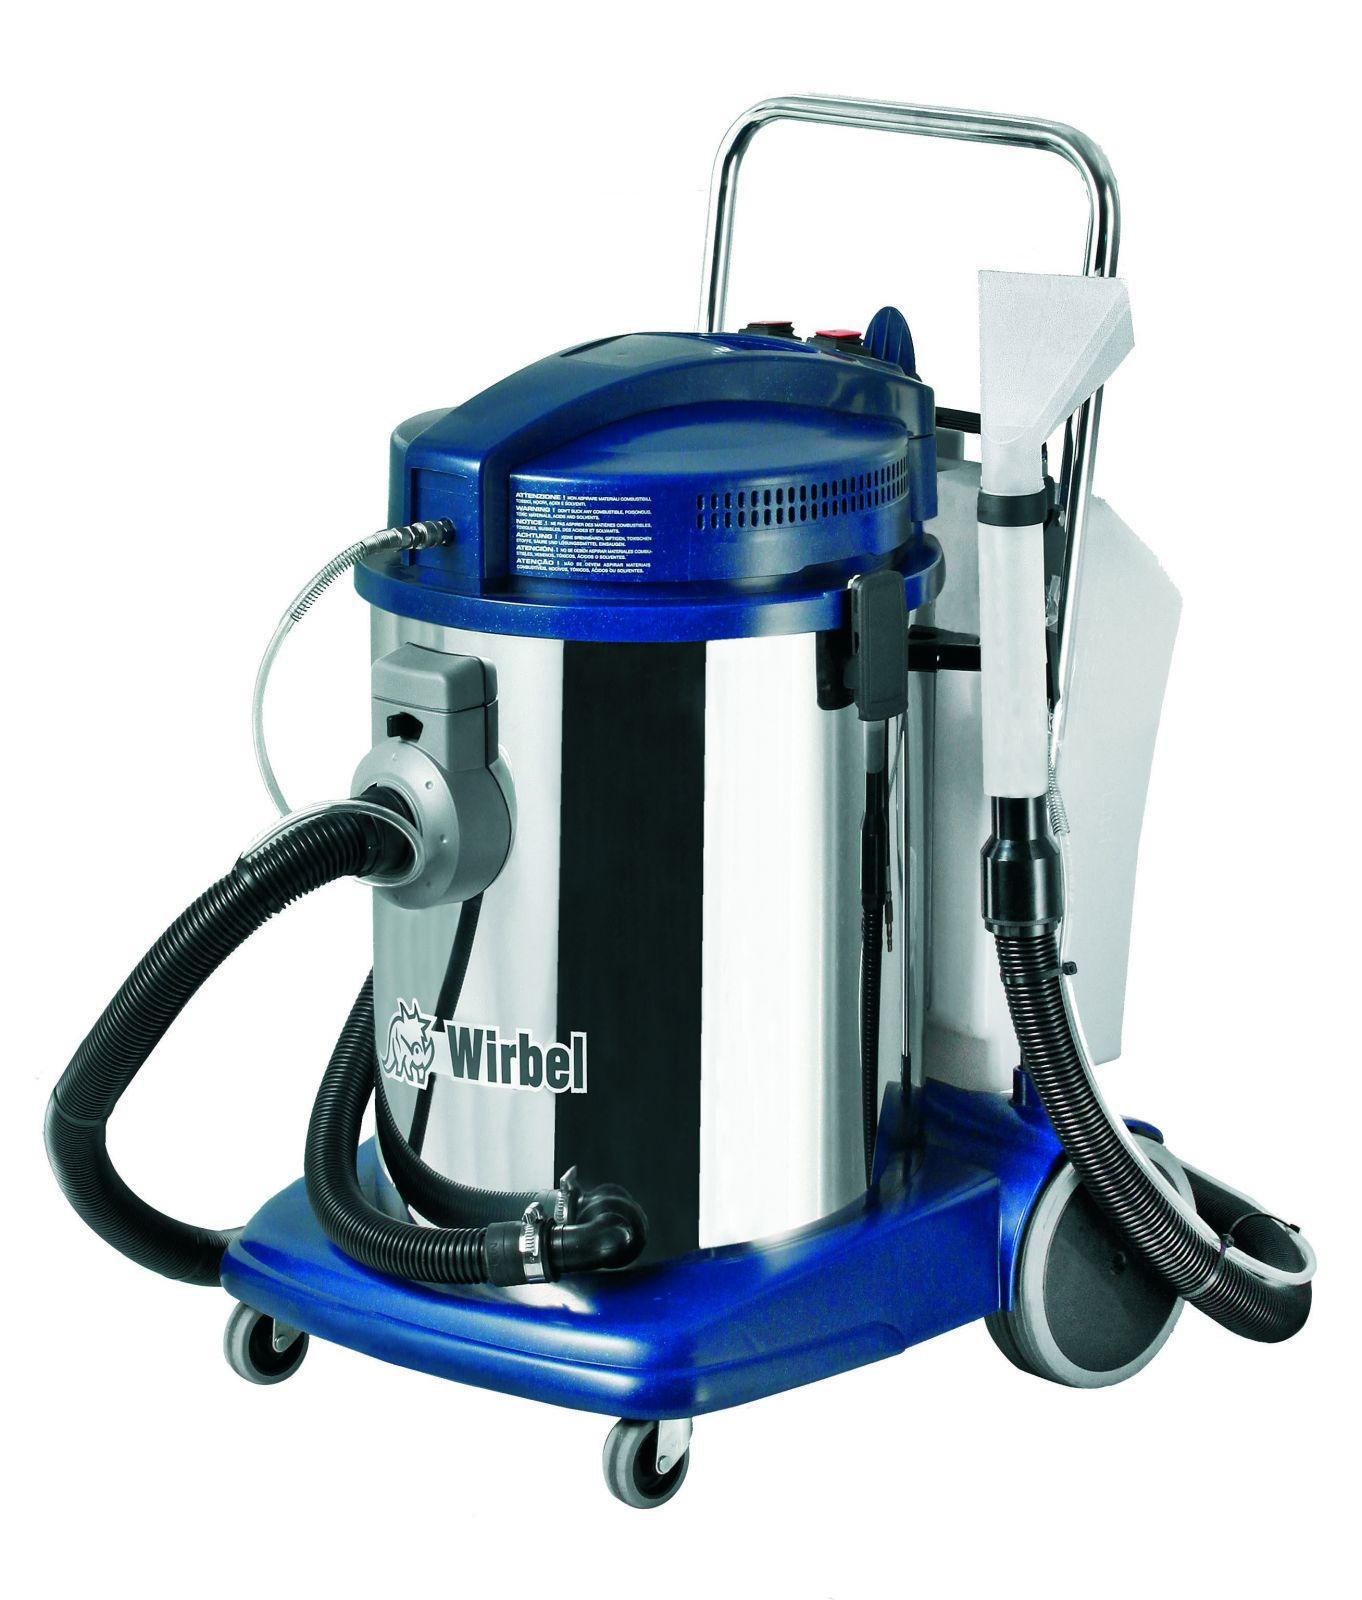 Wirbel Spray extraction spray